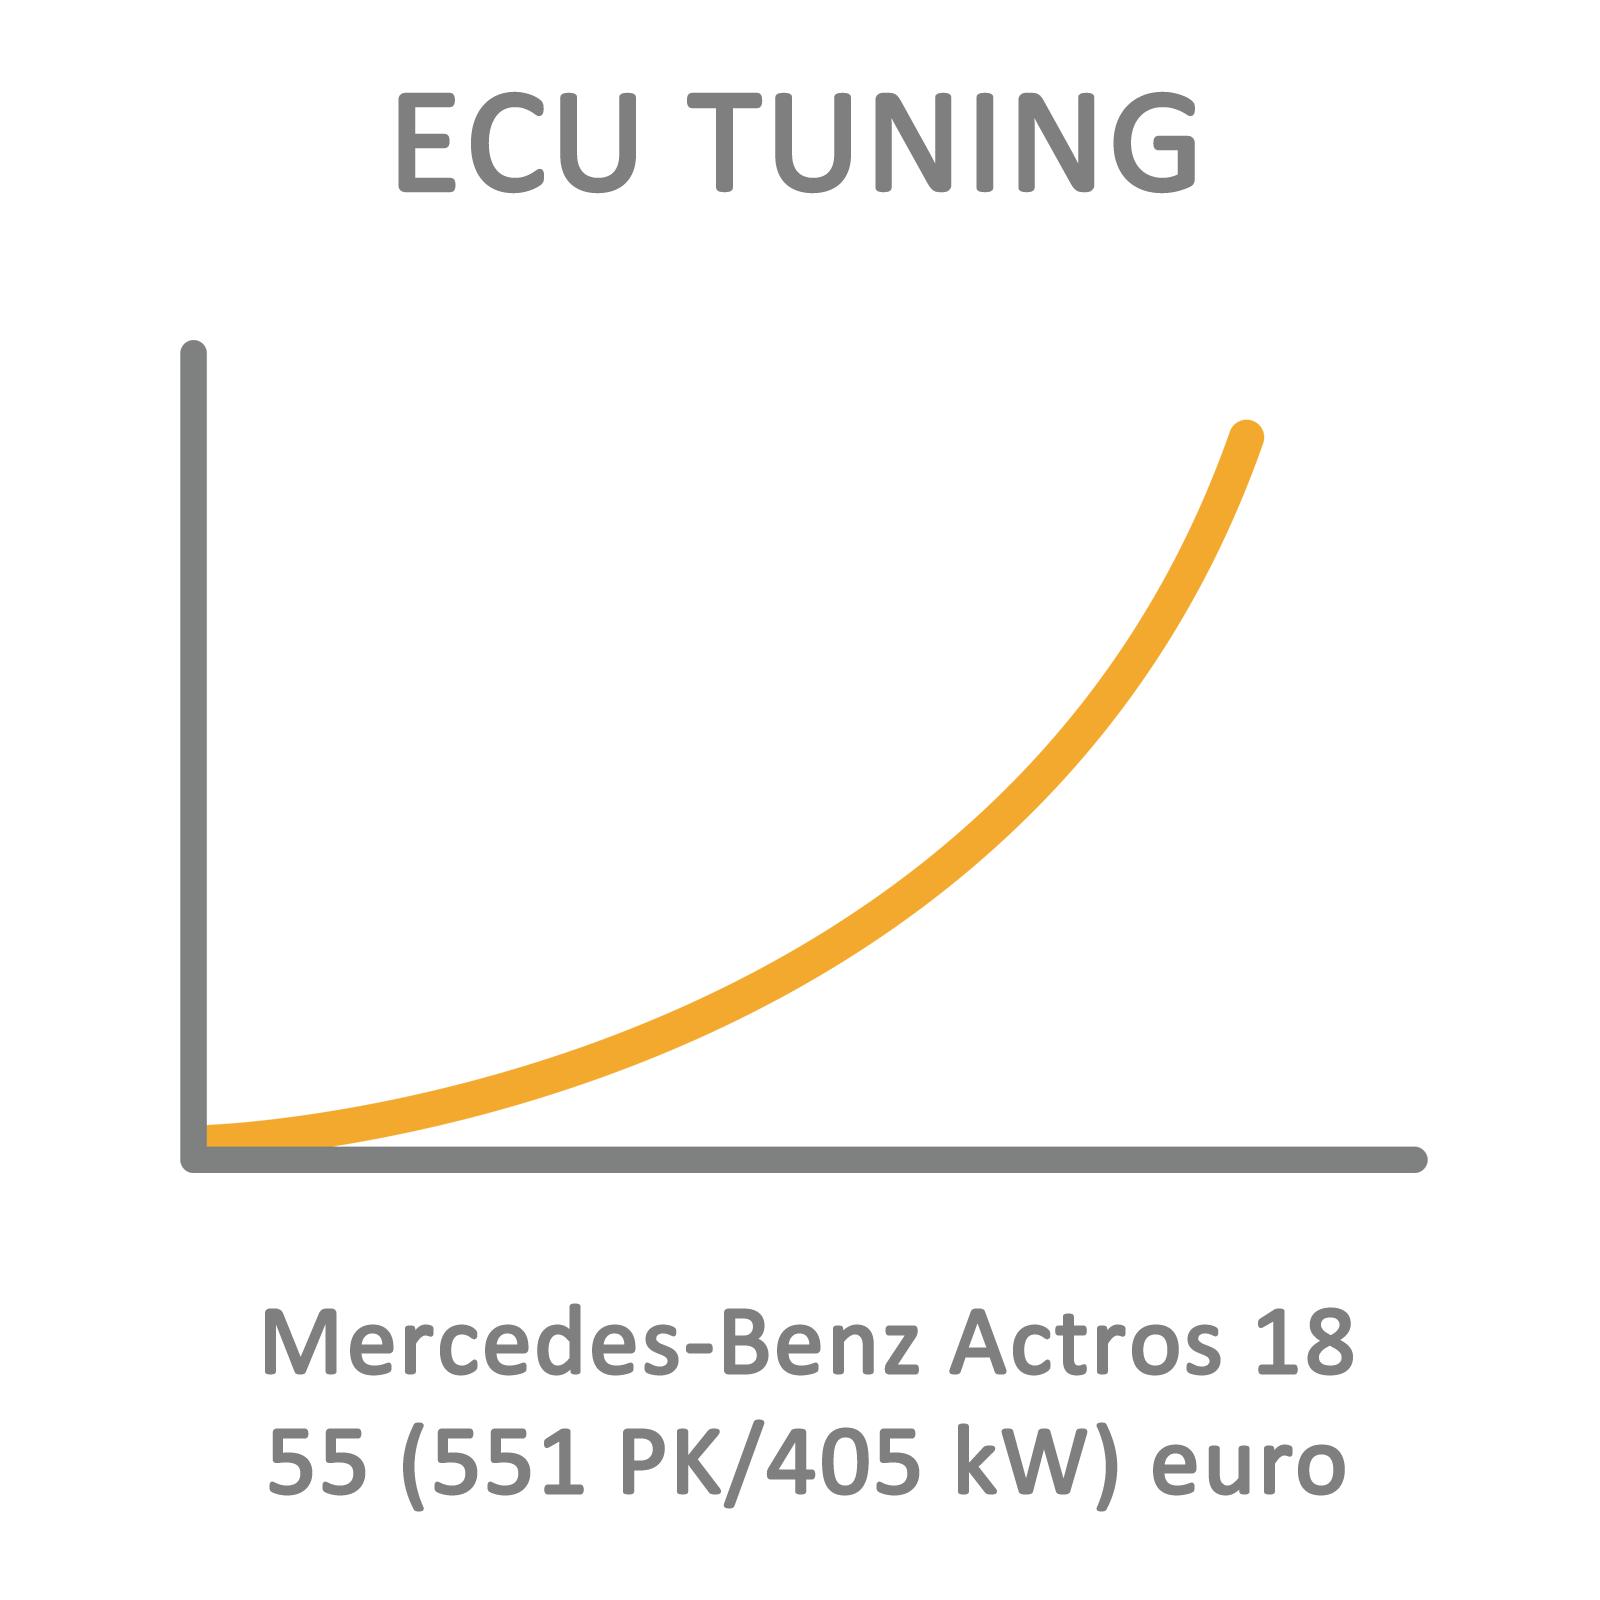 Mercedes-Benz Actros 18 55 (551 PK/405 kW) euro 4+5 ECU